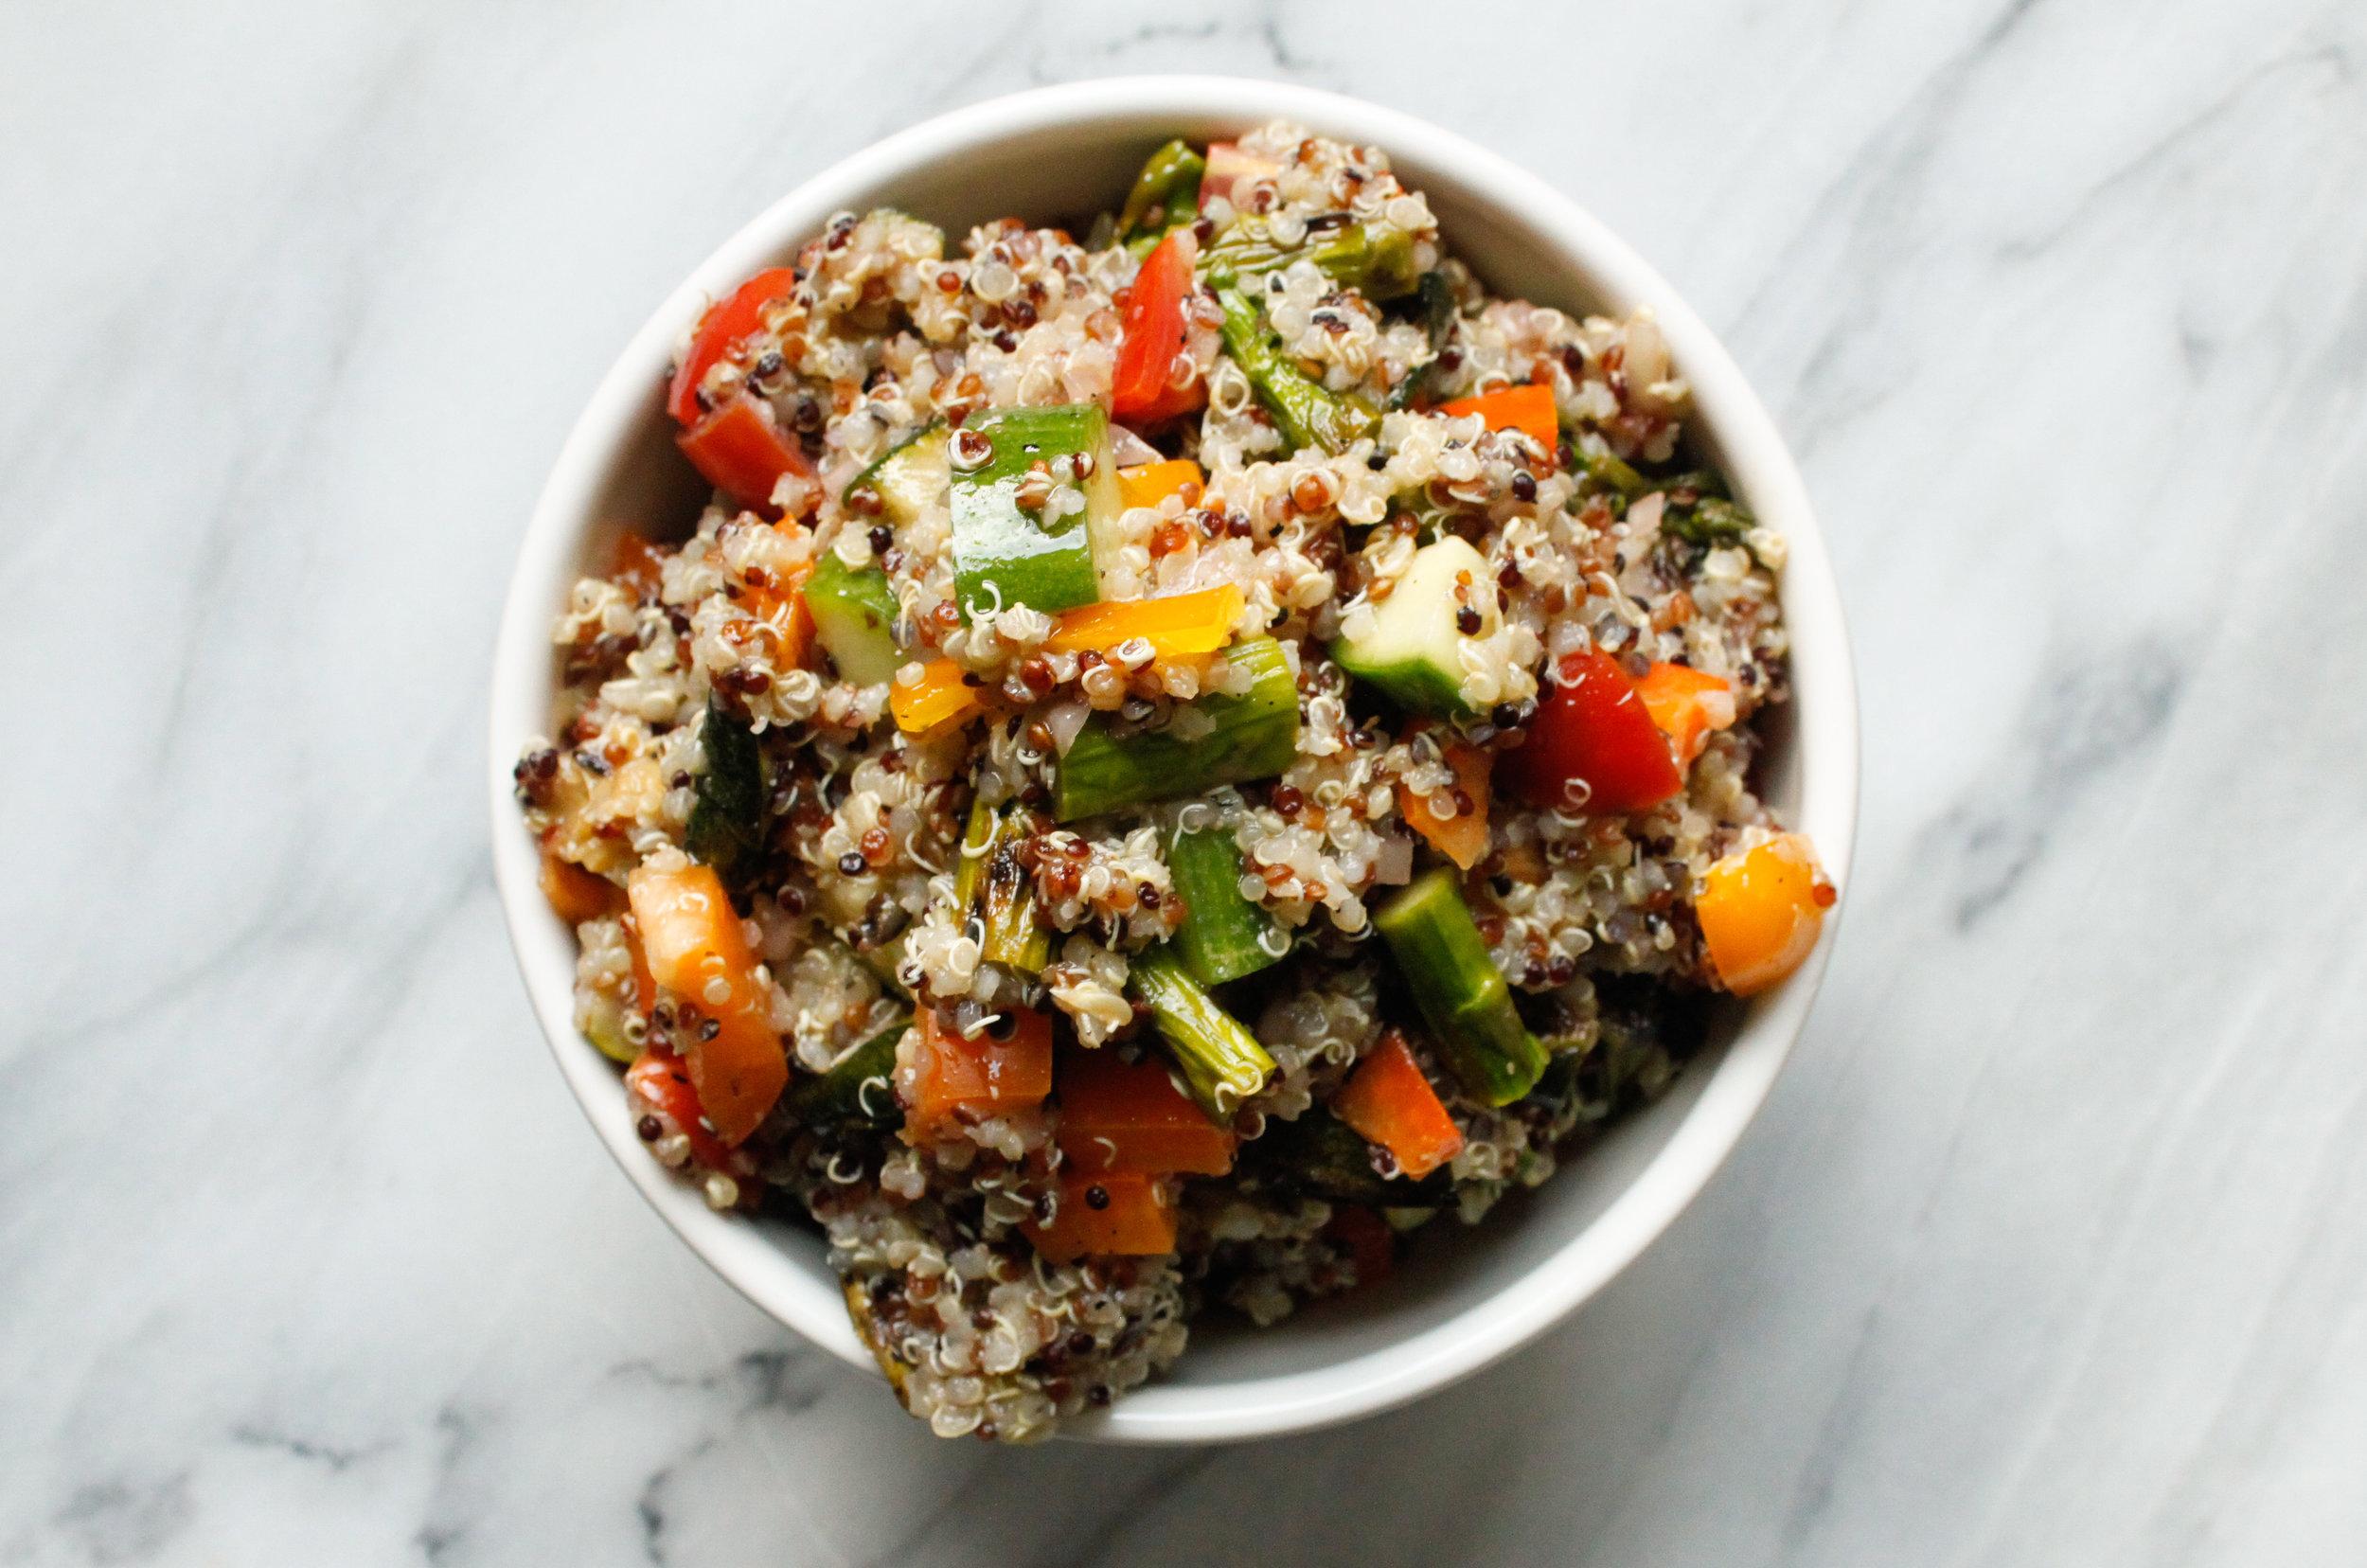 V/GF Grilled Vegetable Quinoa Salad